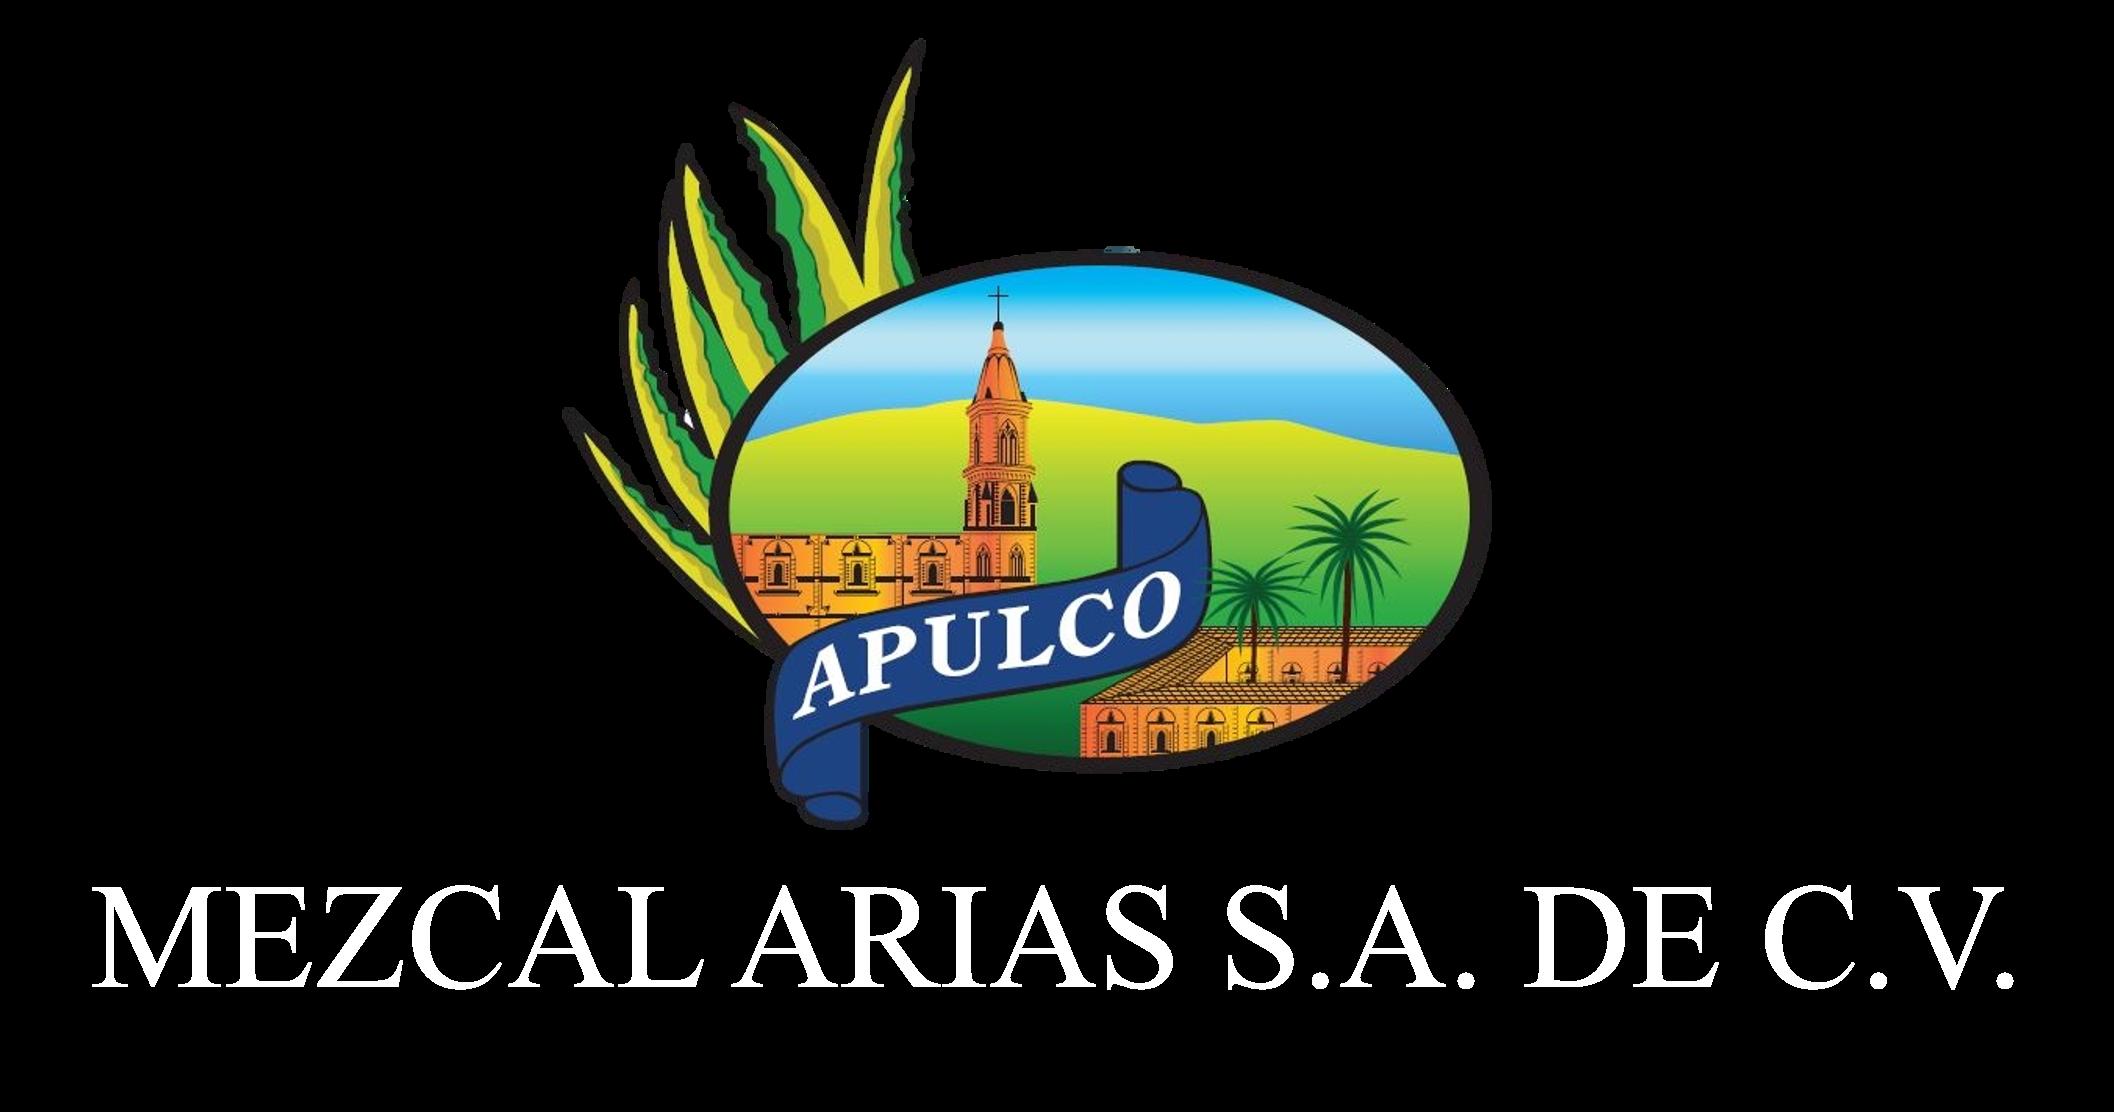 Mezcal Arias